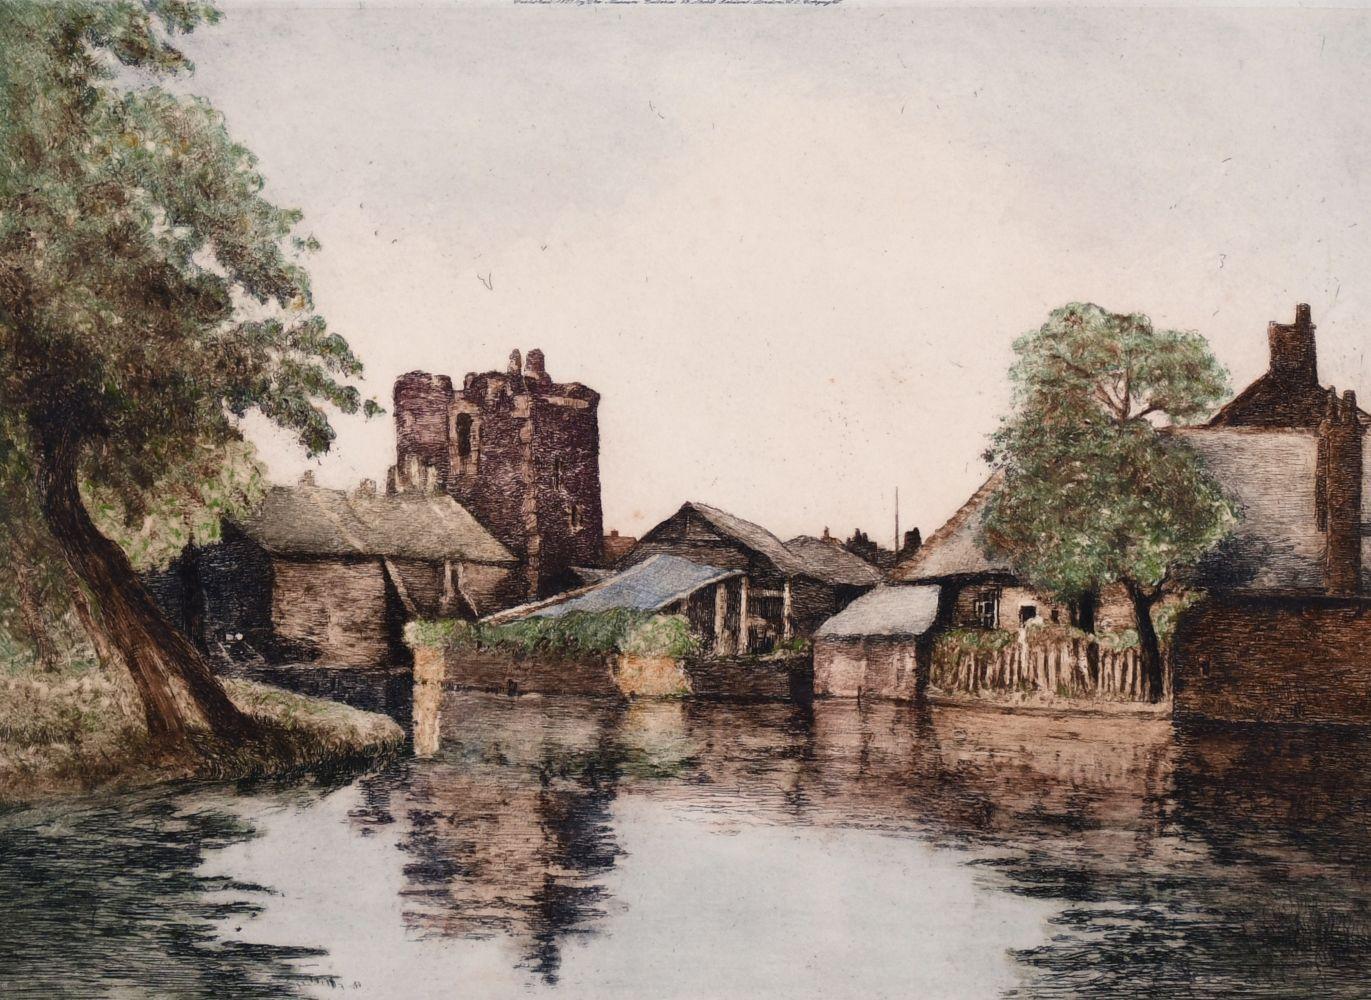 William Tatton Winter (1855-1928). 'Sudbury Watch Tower, Canterbury' Etching, Signed in Pencil.